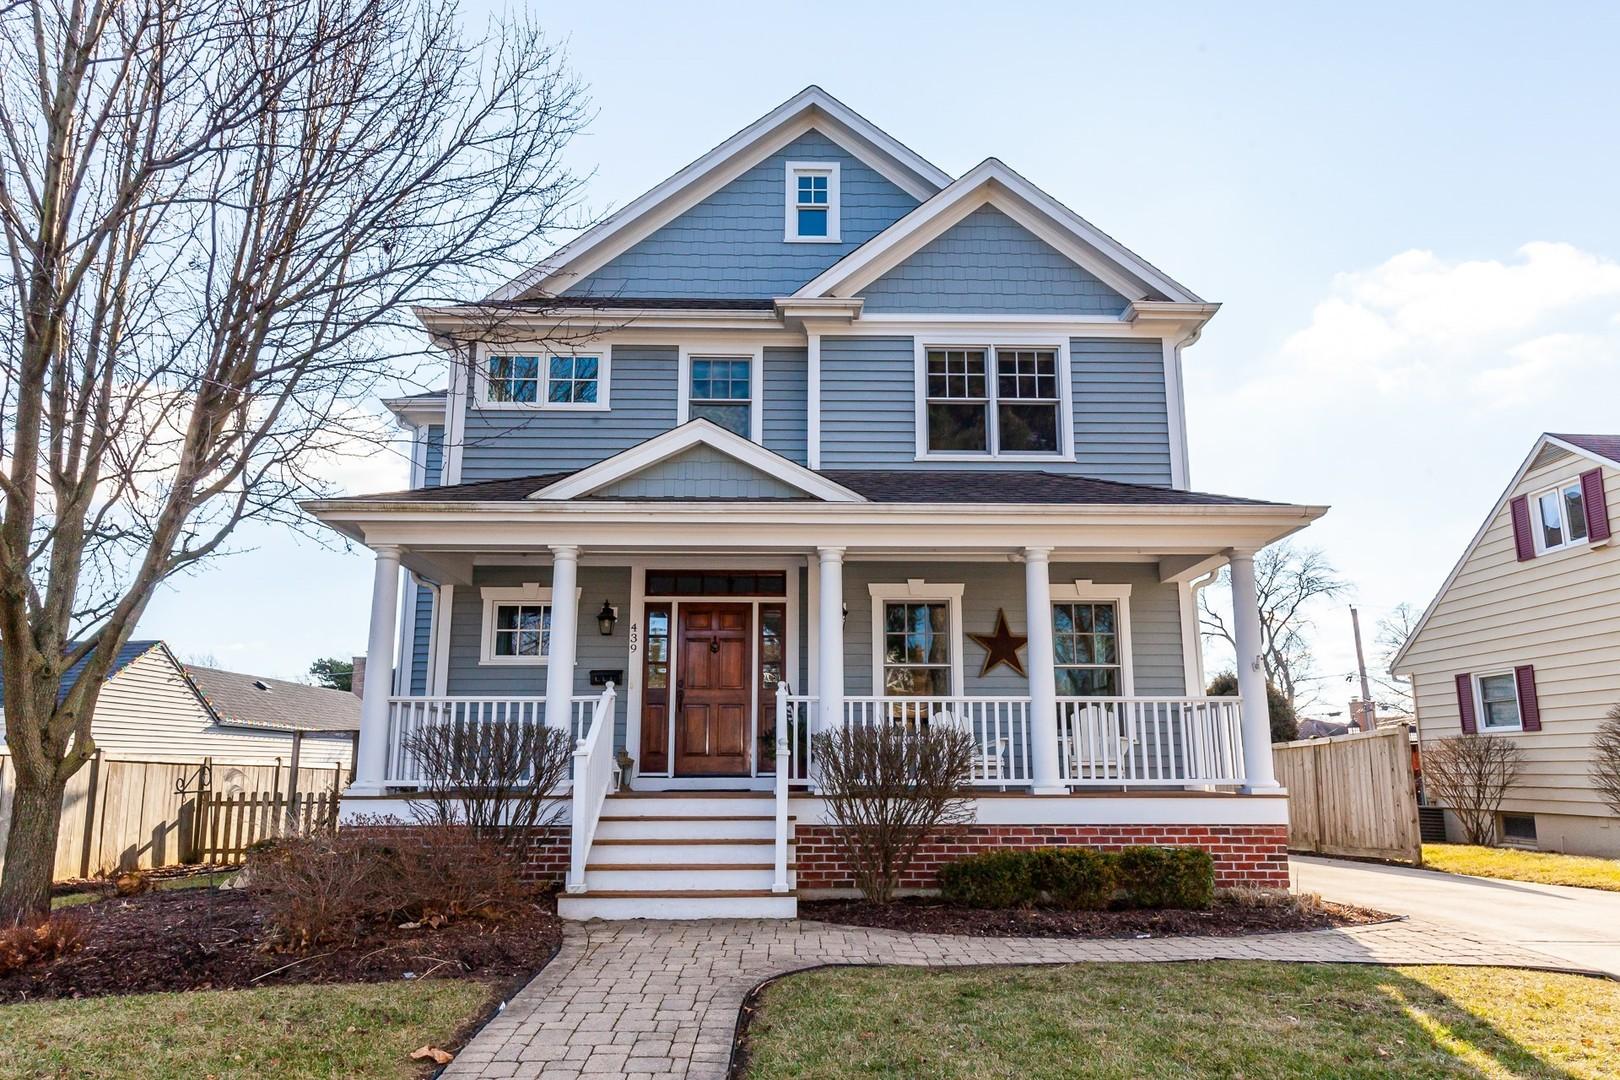 439 Grant Street, Downers Grove, Illinois